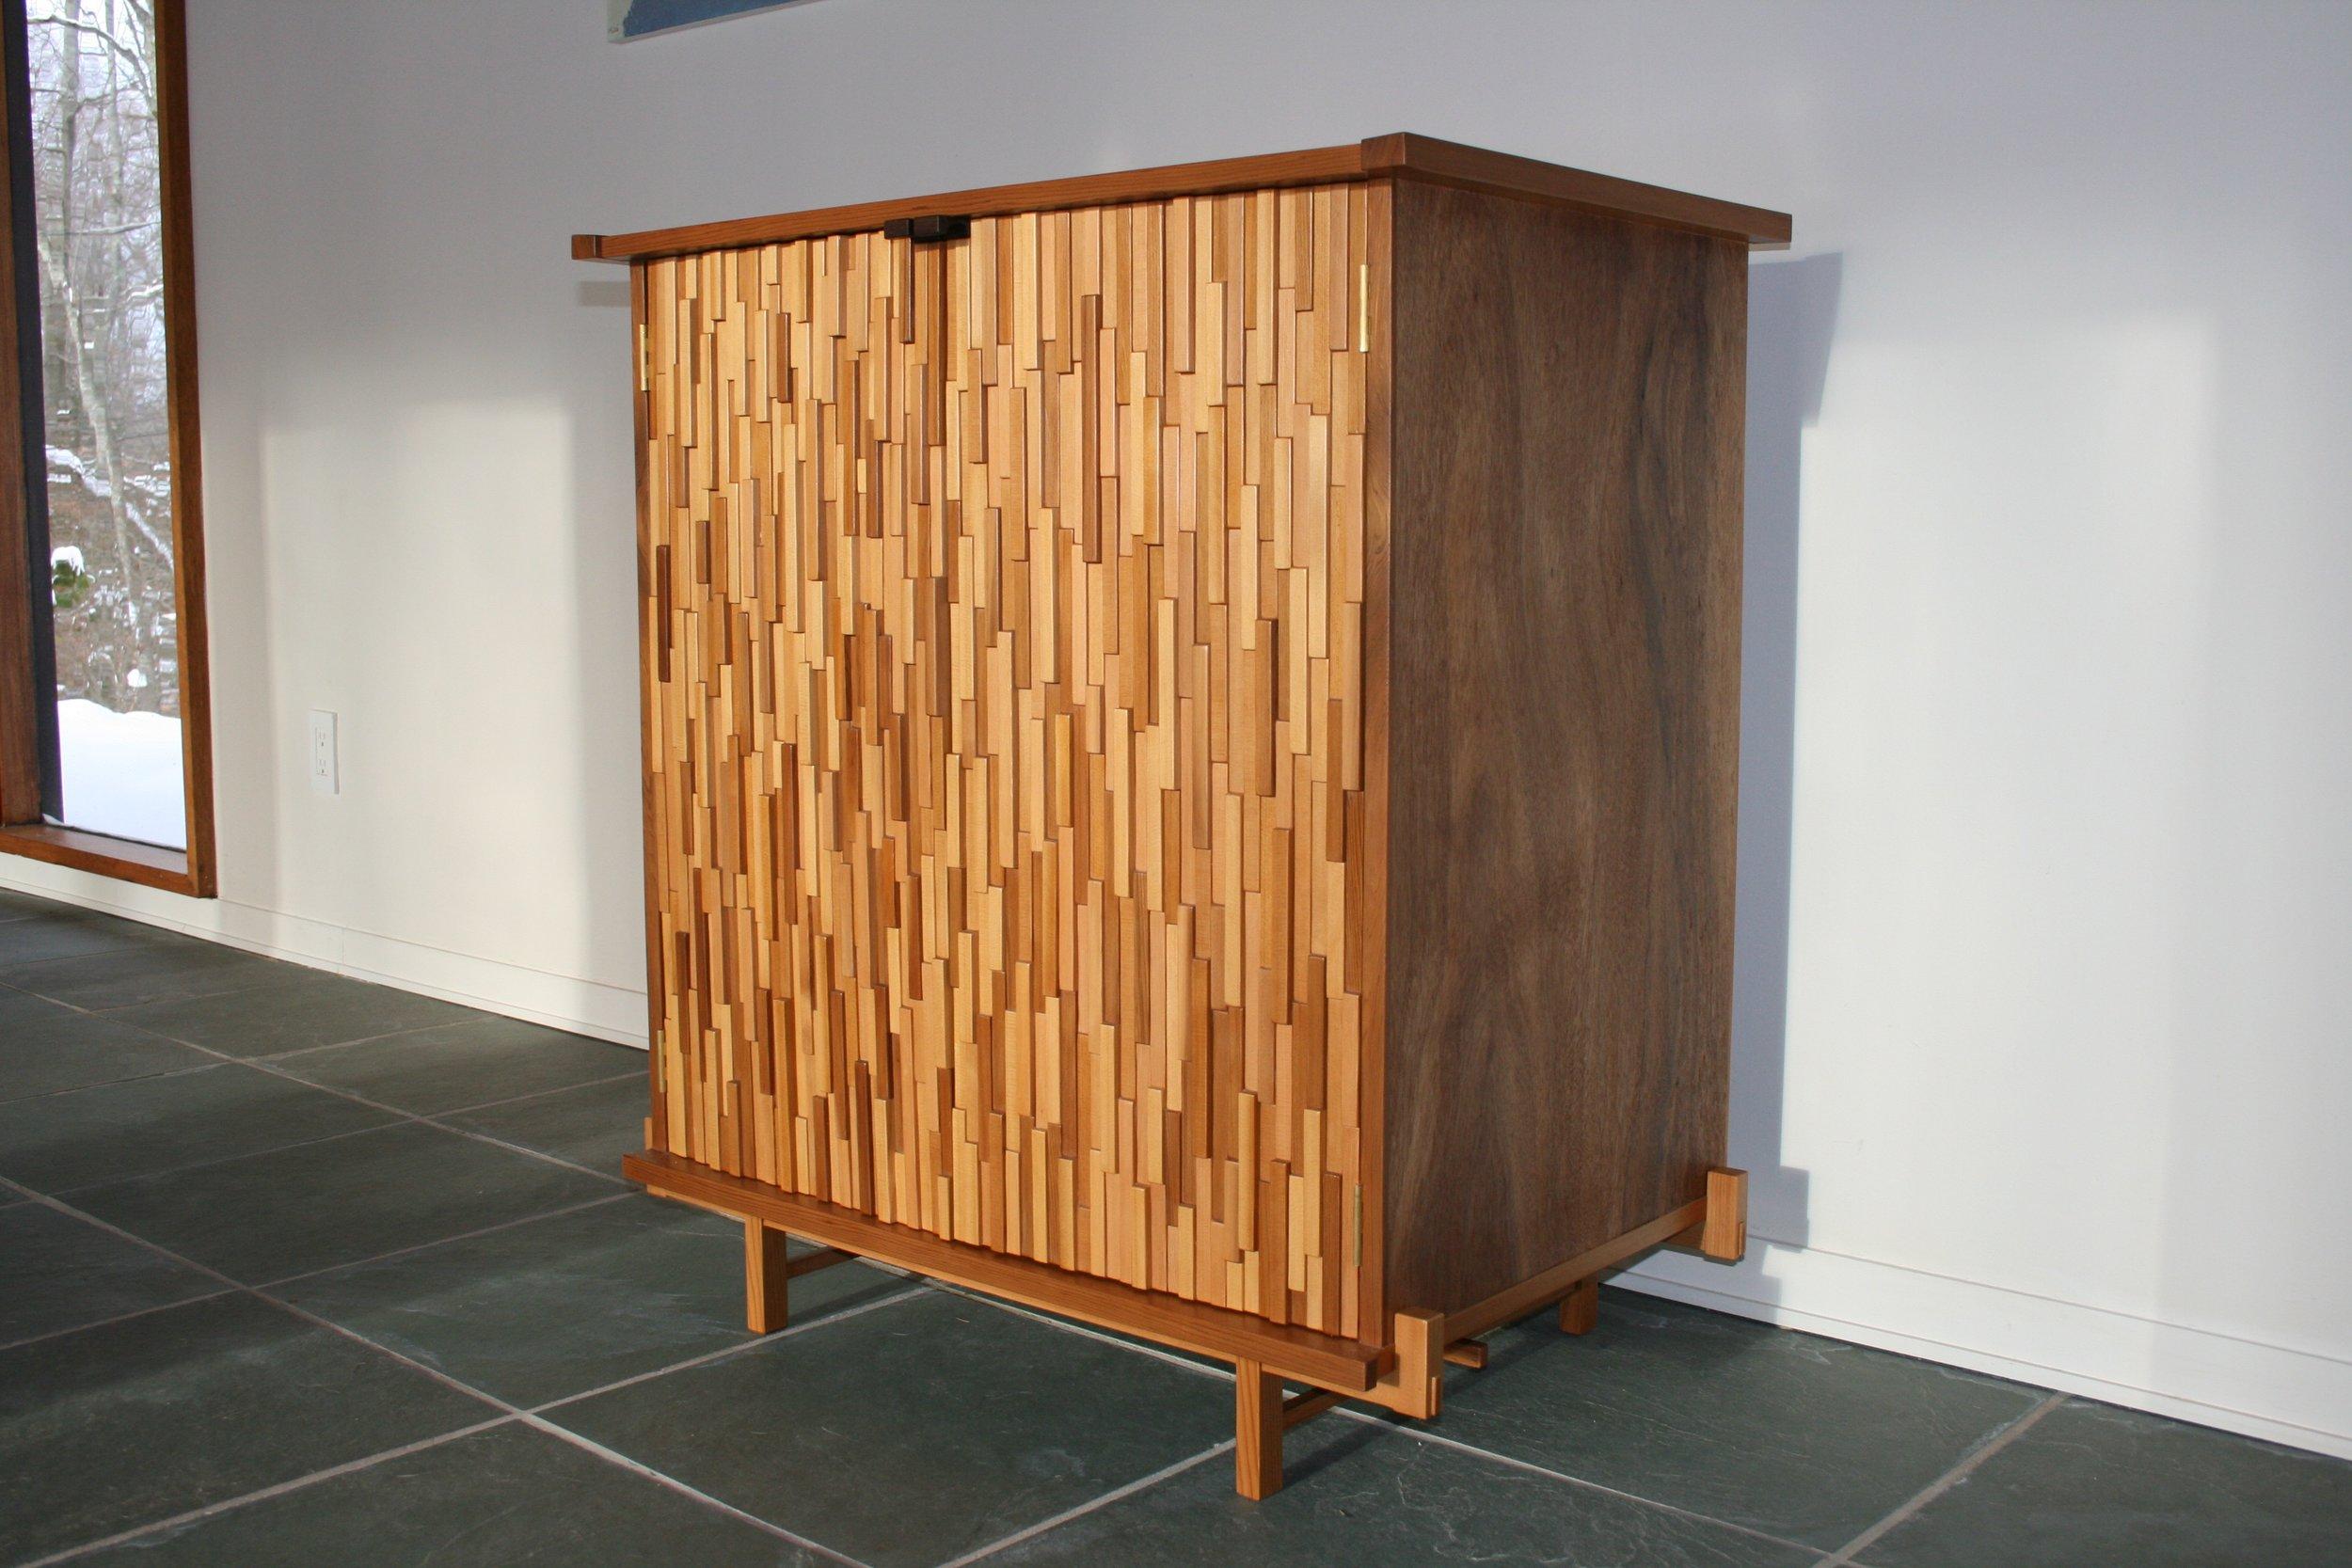 Messler Gallery - Alumni & Fellows Exhibition - The Center for Furniture CraftsmanshipJanuary 20 - April 5, 2017